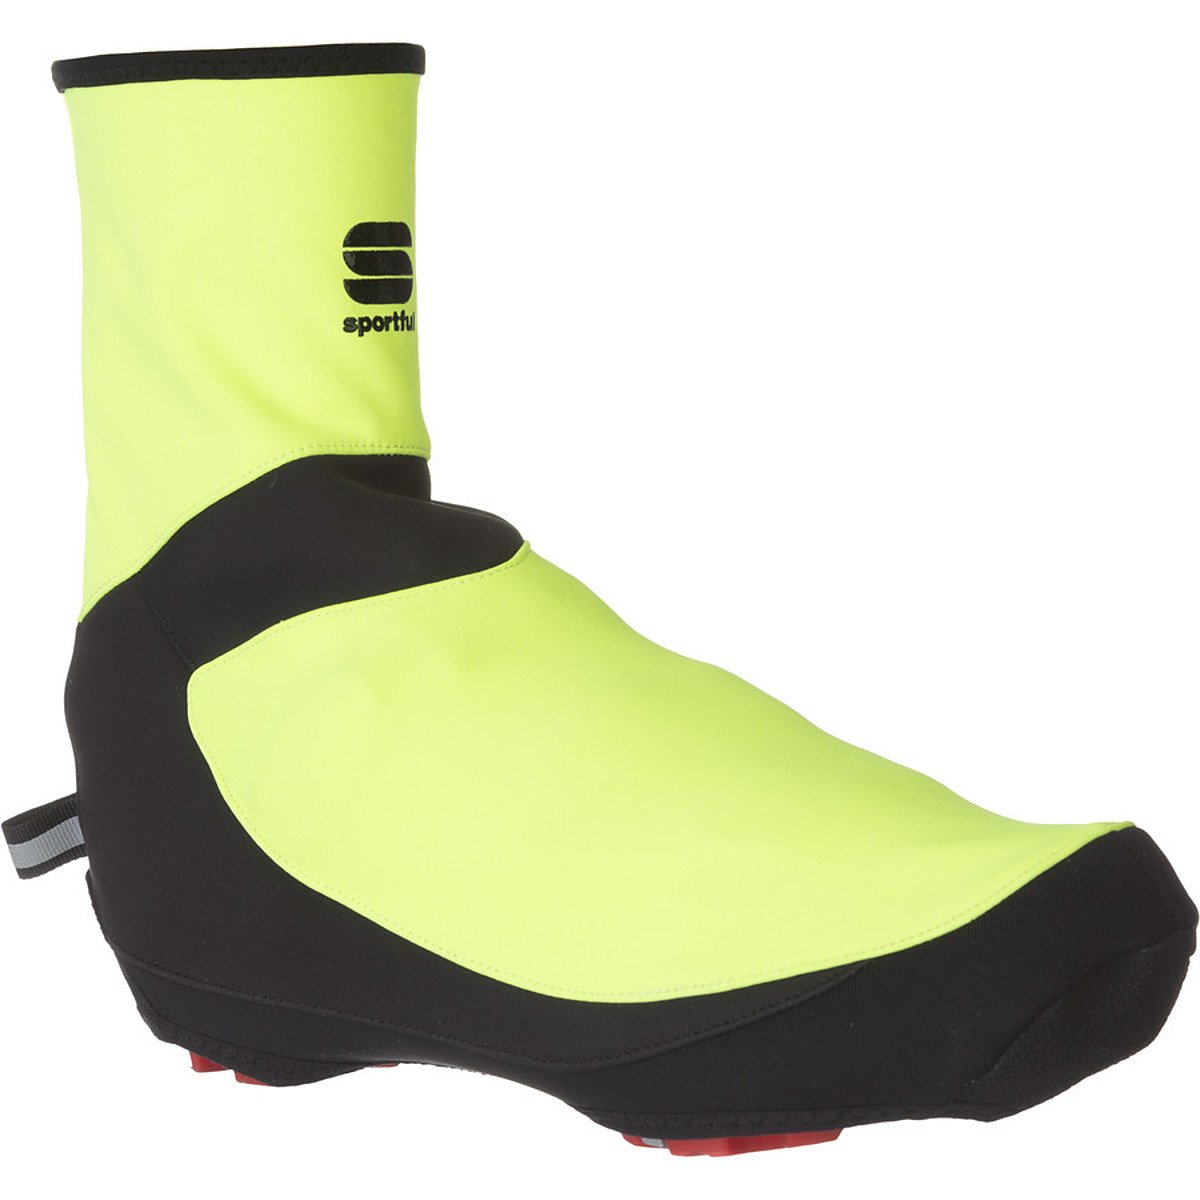 - Sportful Roubaix, Thermo Neon schuhecovers 2015